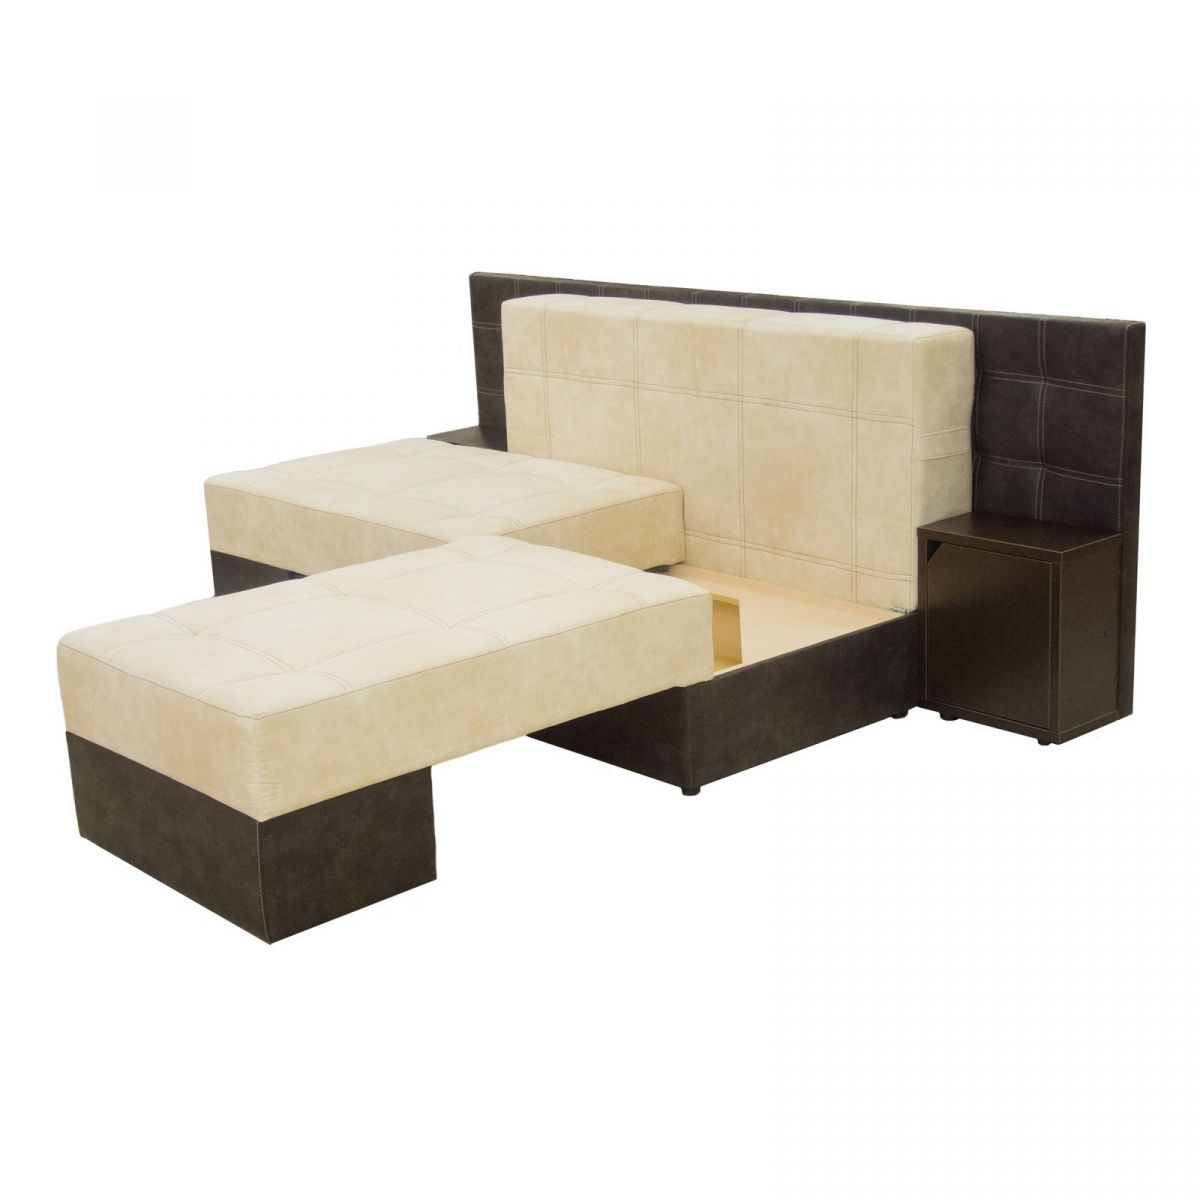 Диван-кровать Оливия-1